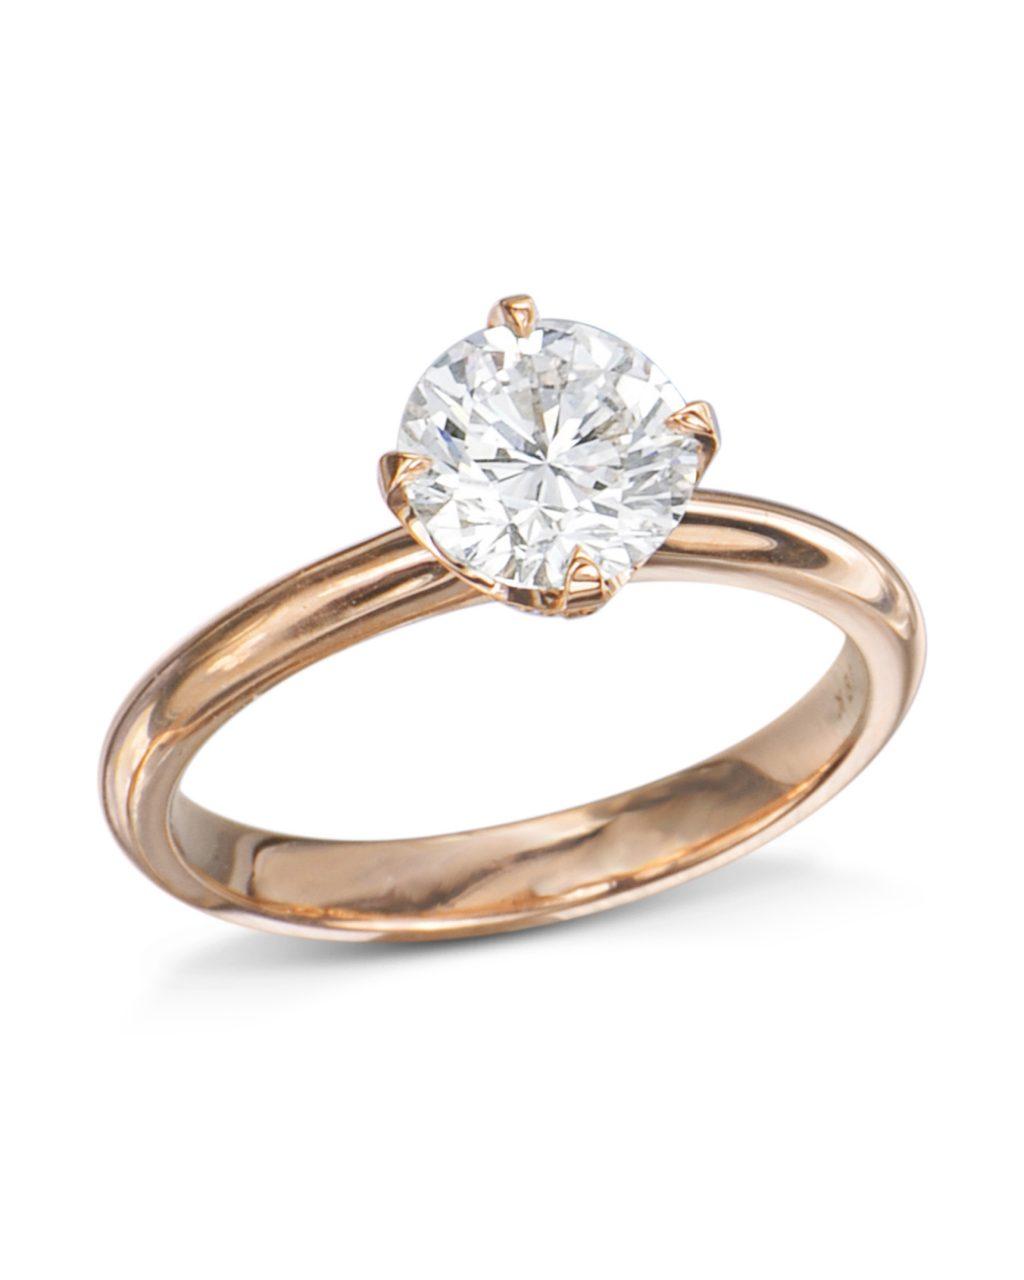 c4e895207 Rose Gold Pavé Cup Diamond Engagement Ring - Turgeon Raine